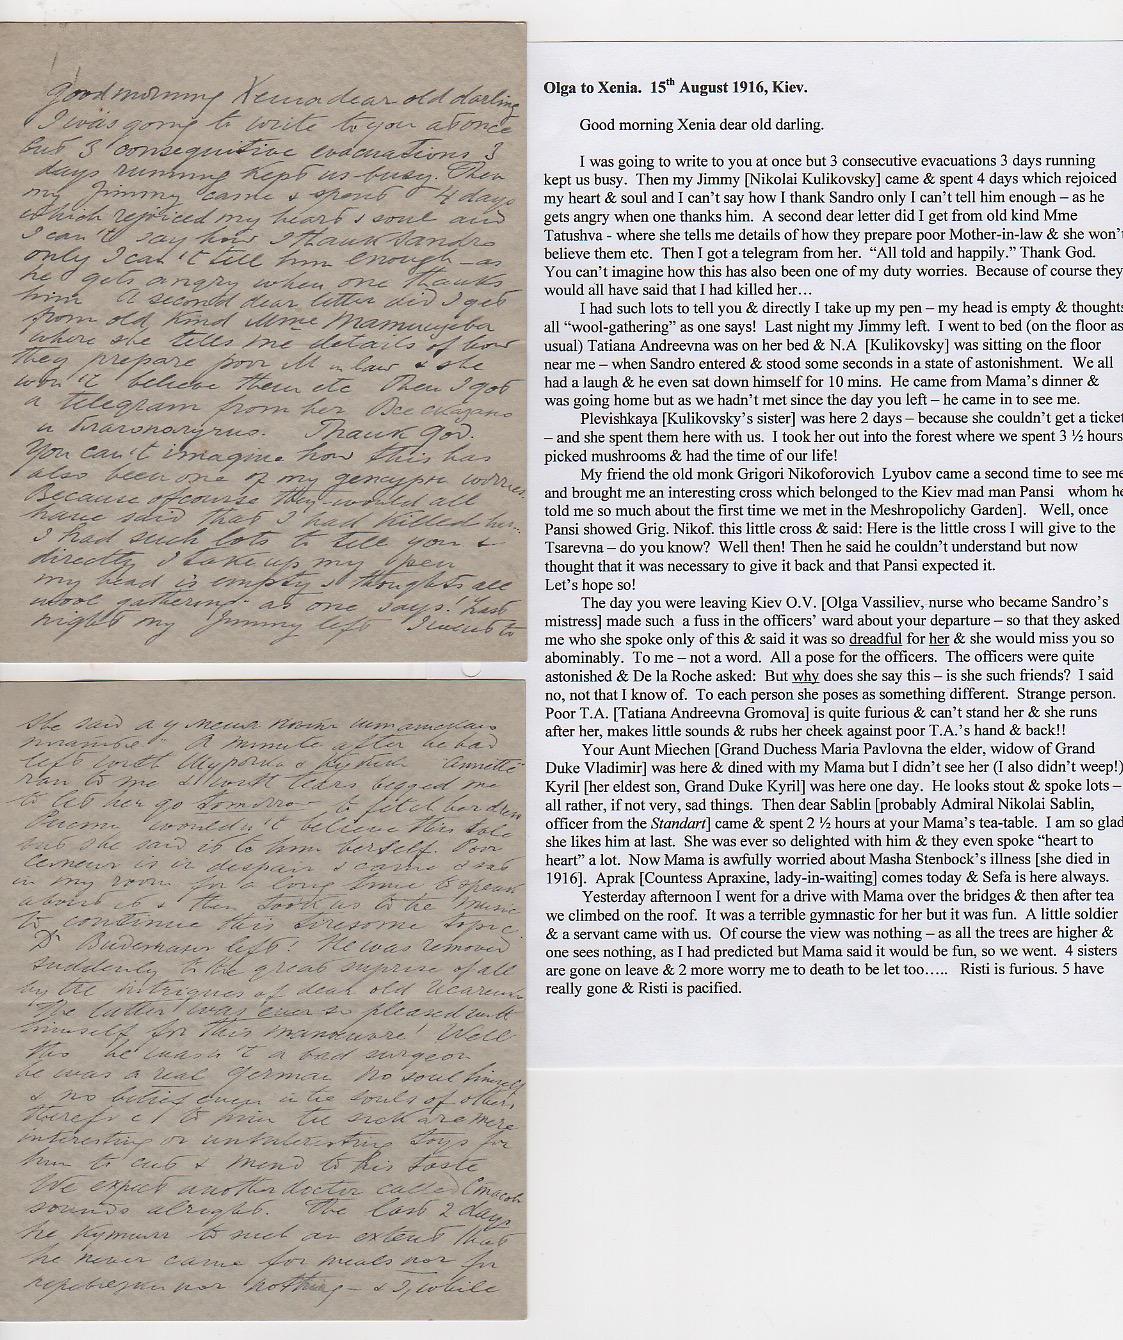 Royalty Grand Duchess Olga Correspondence To Her Sister Grand Duchess Xenia 1916-1920 - Image 27 of 47